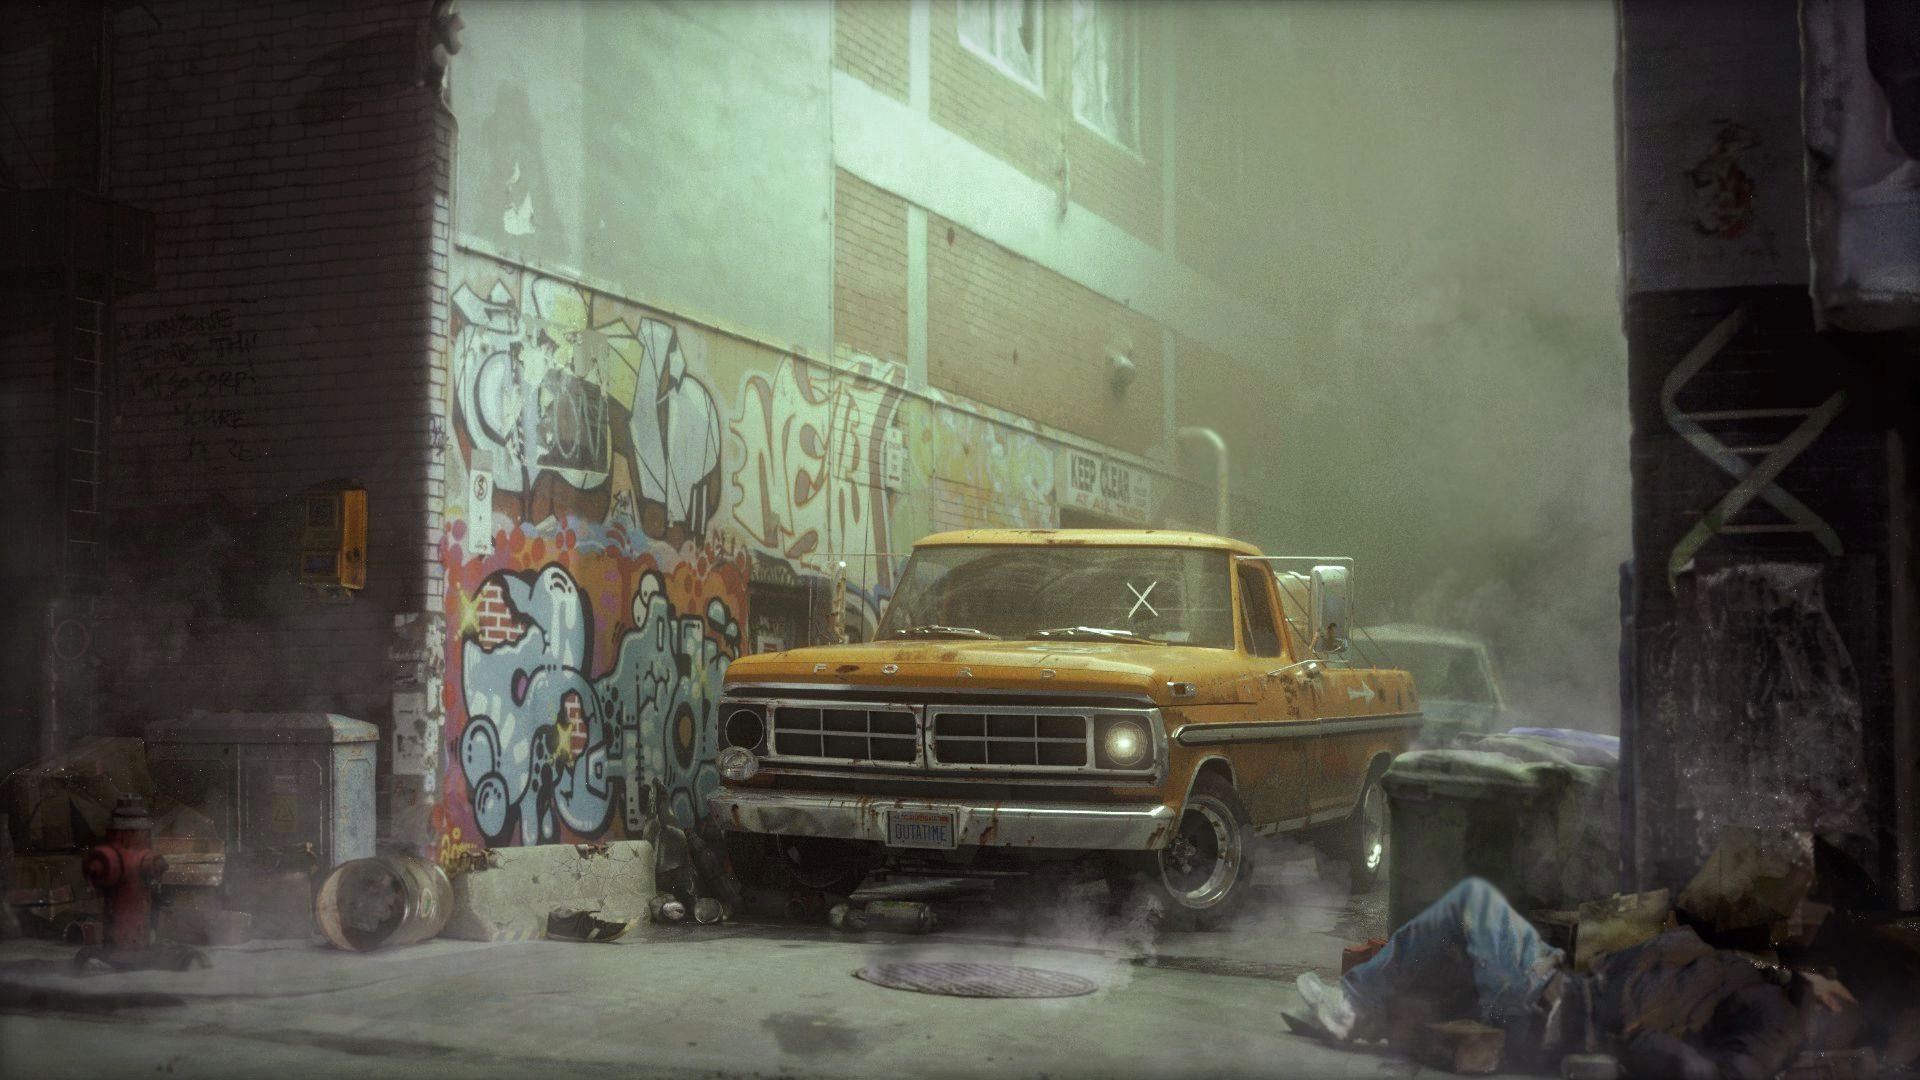 James o brien street 01